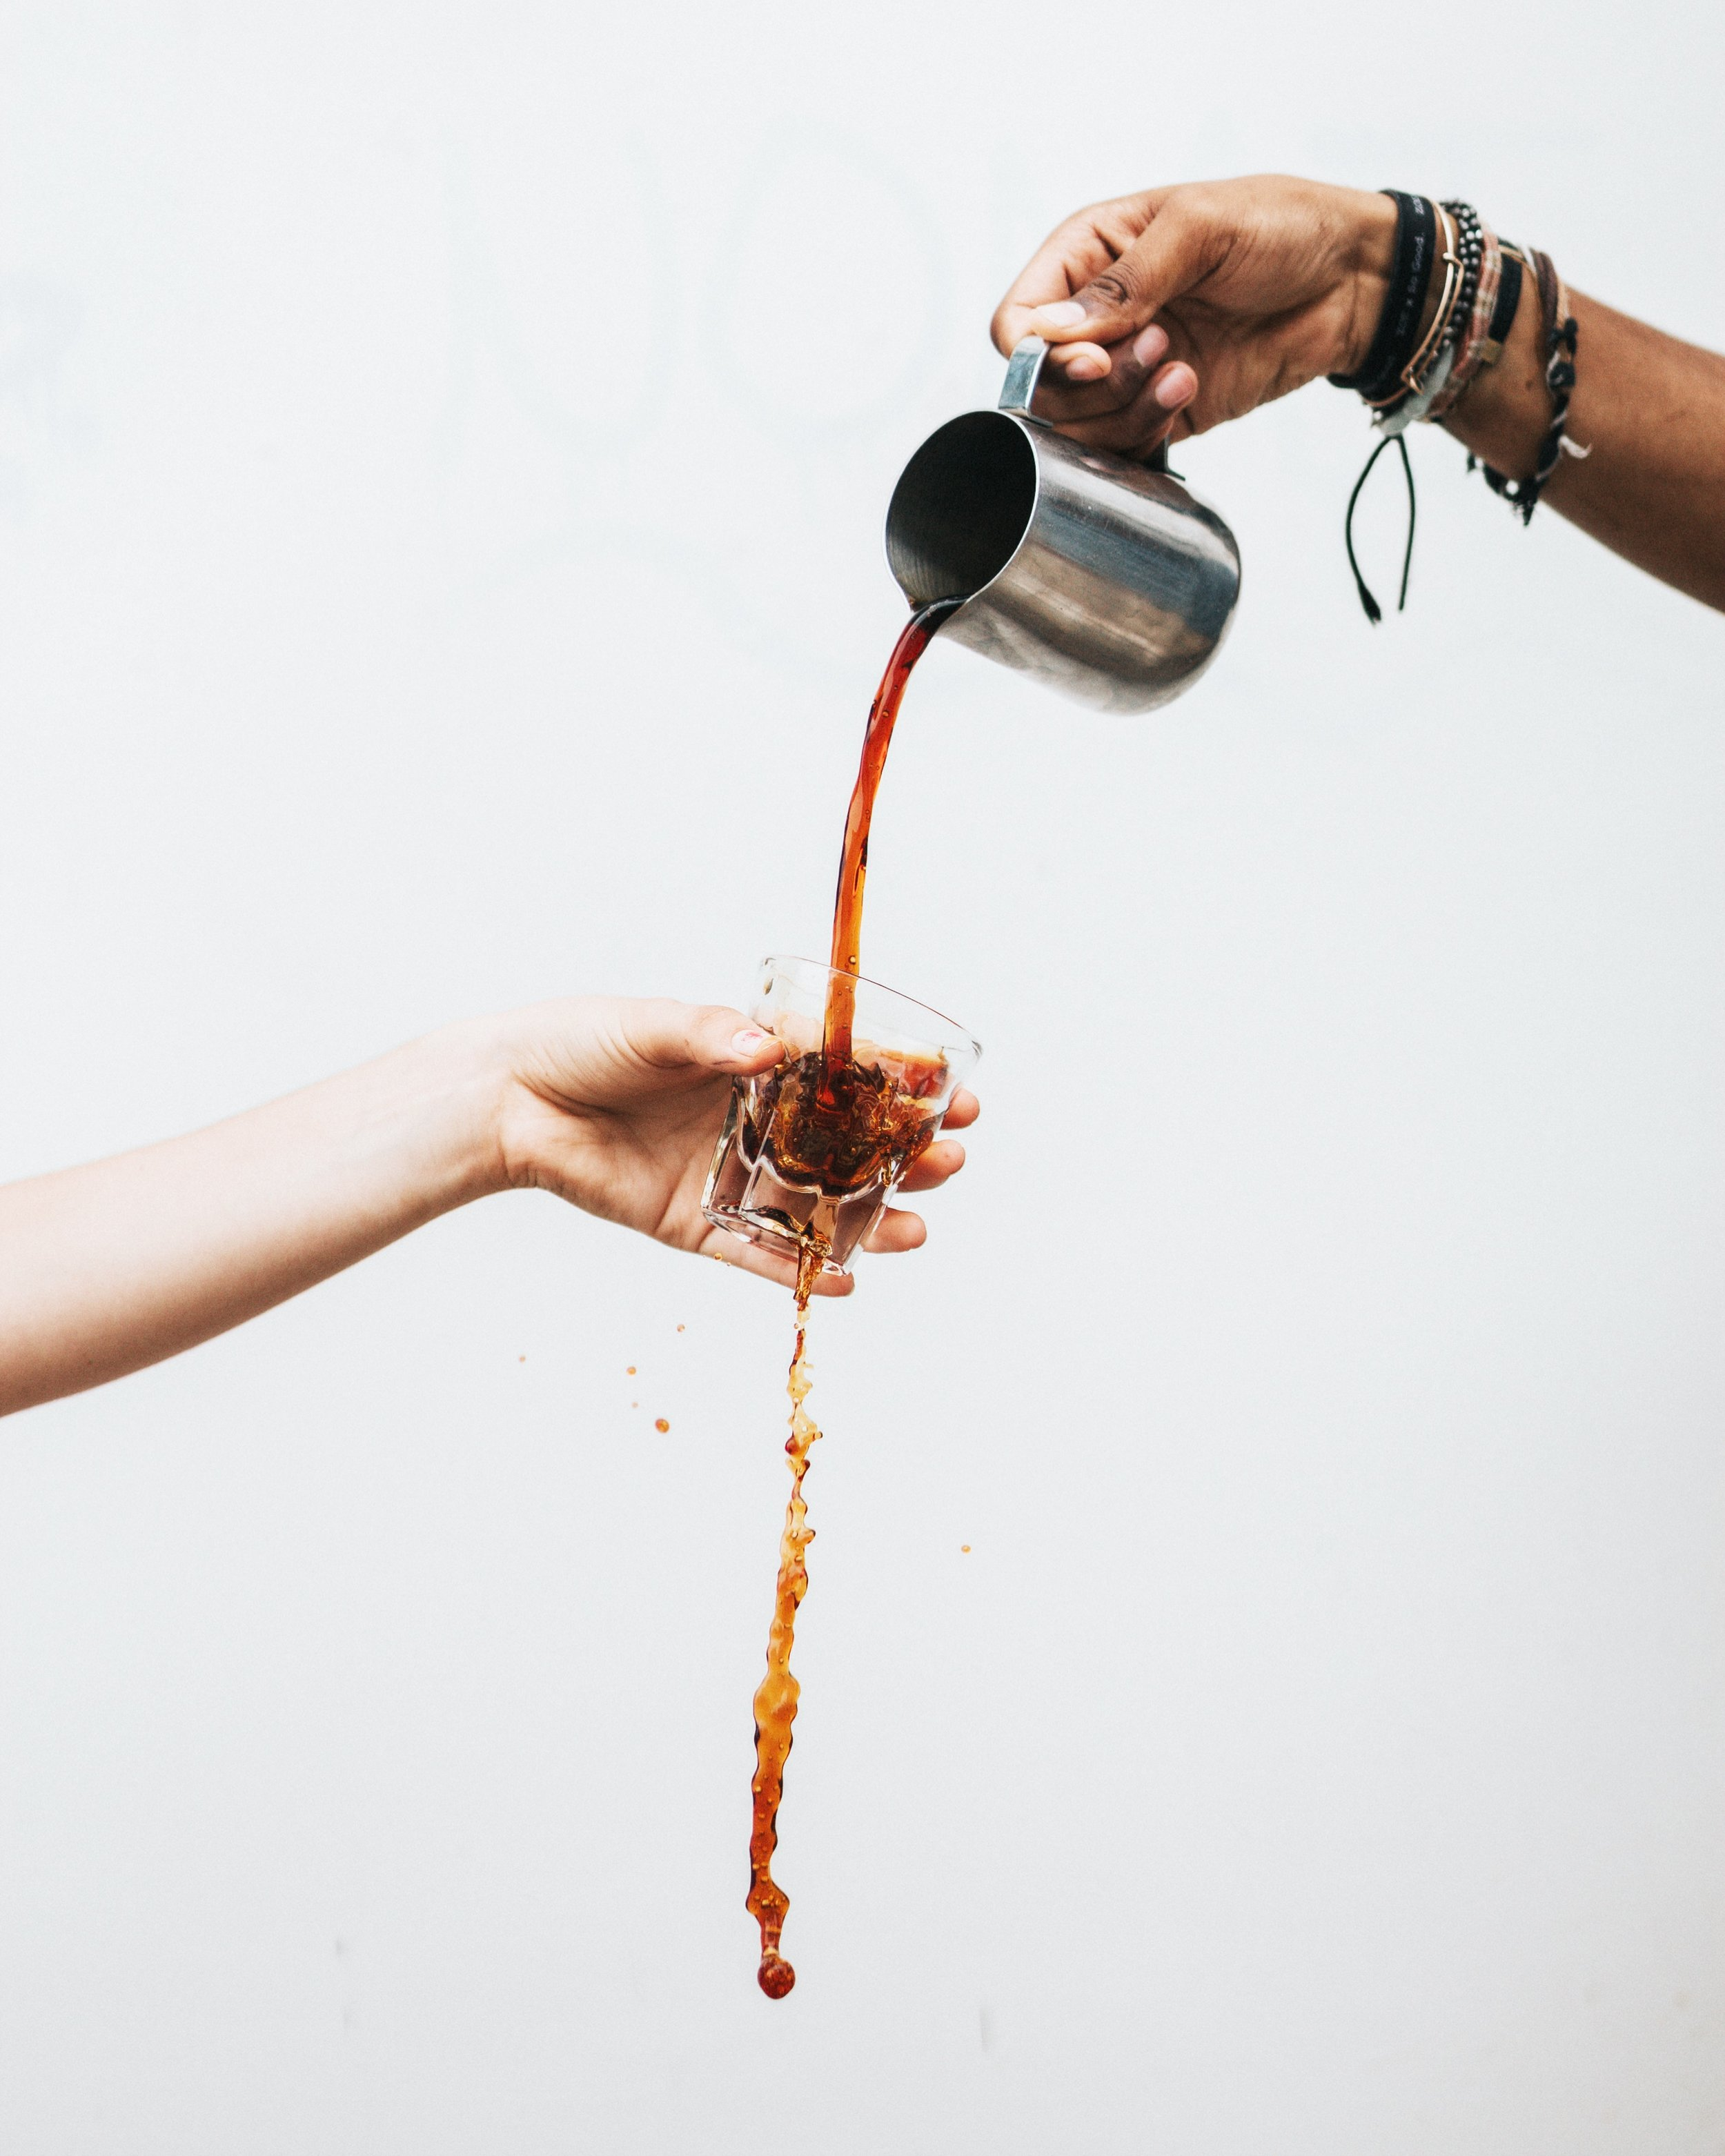 Coffee in Th2 dominant autoimmune diseases